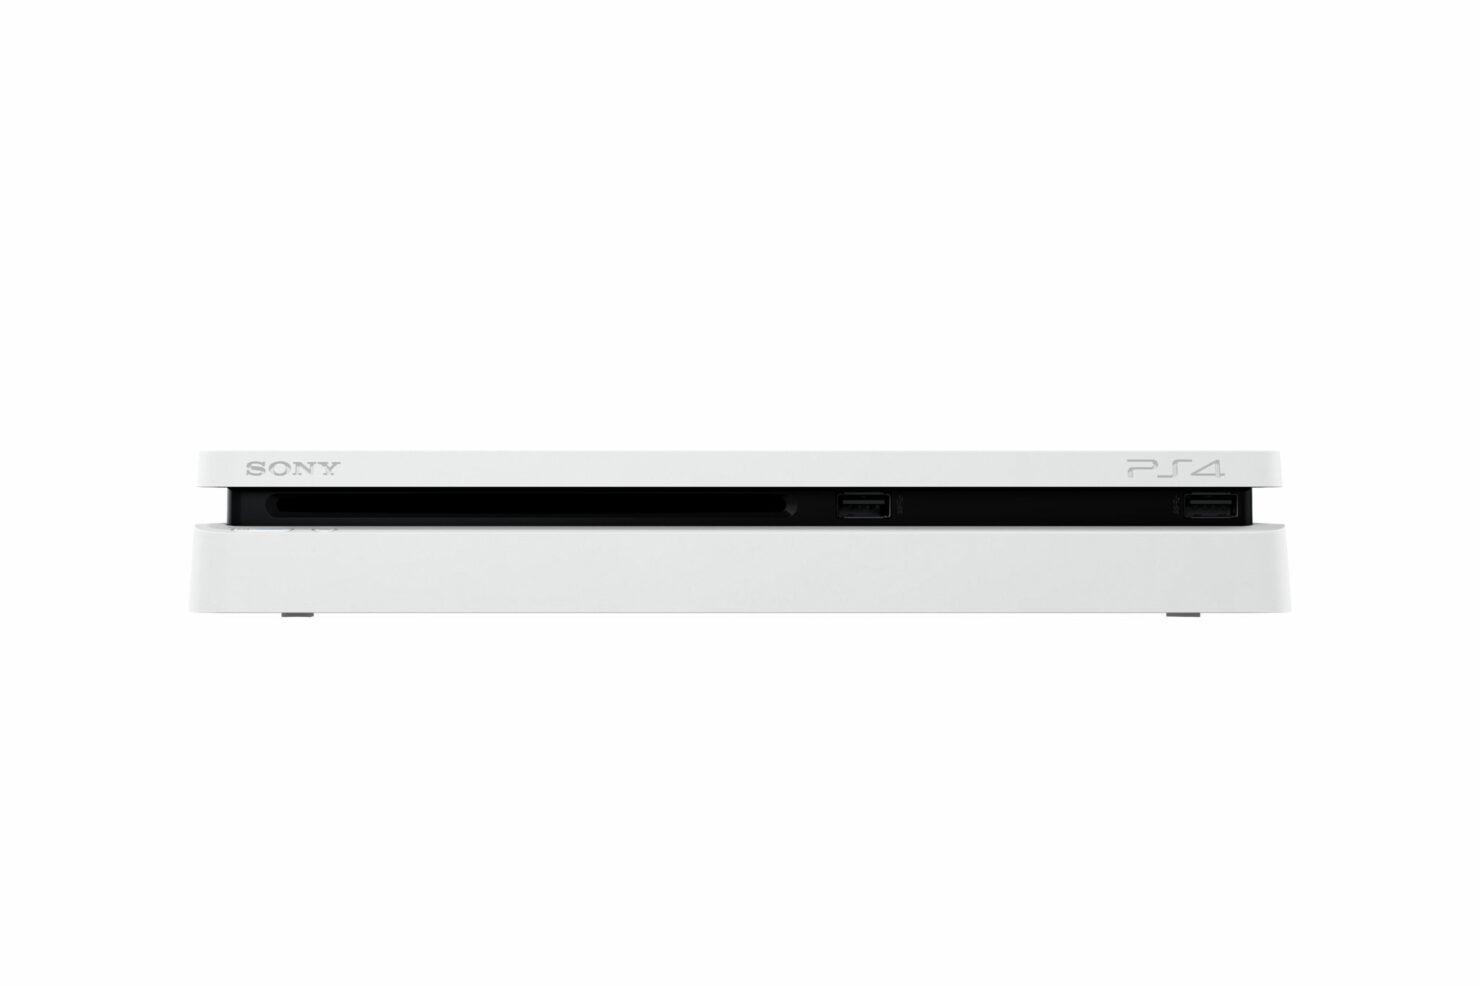 glacier white PlayStation 4 Slim